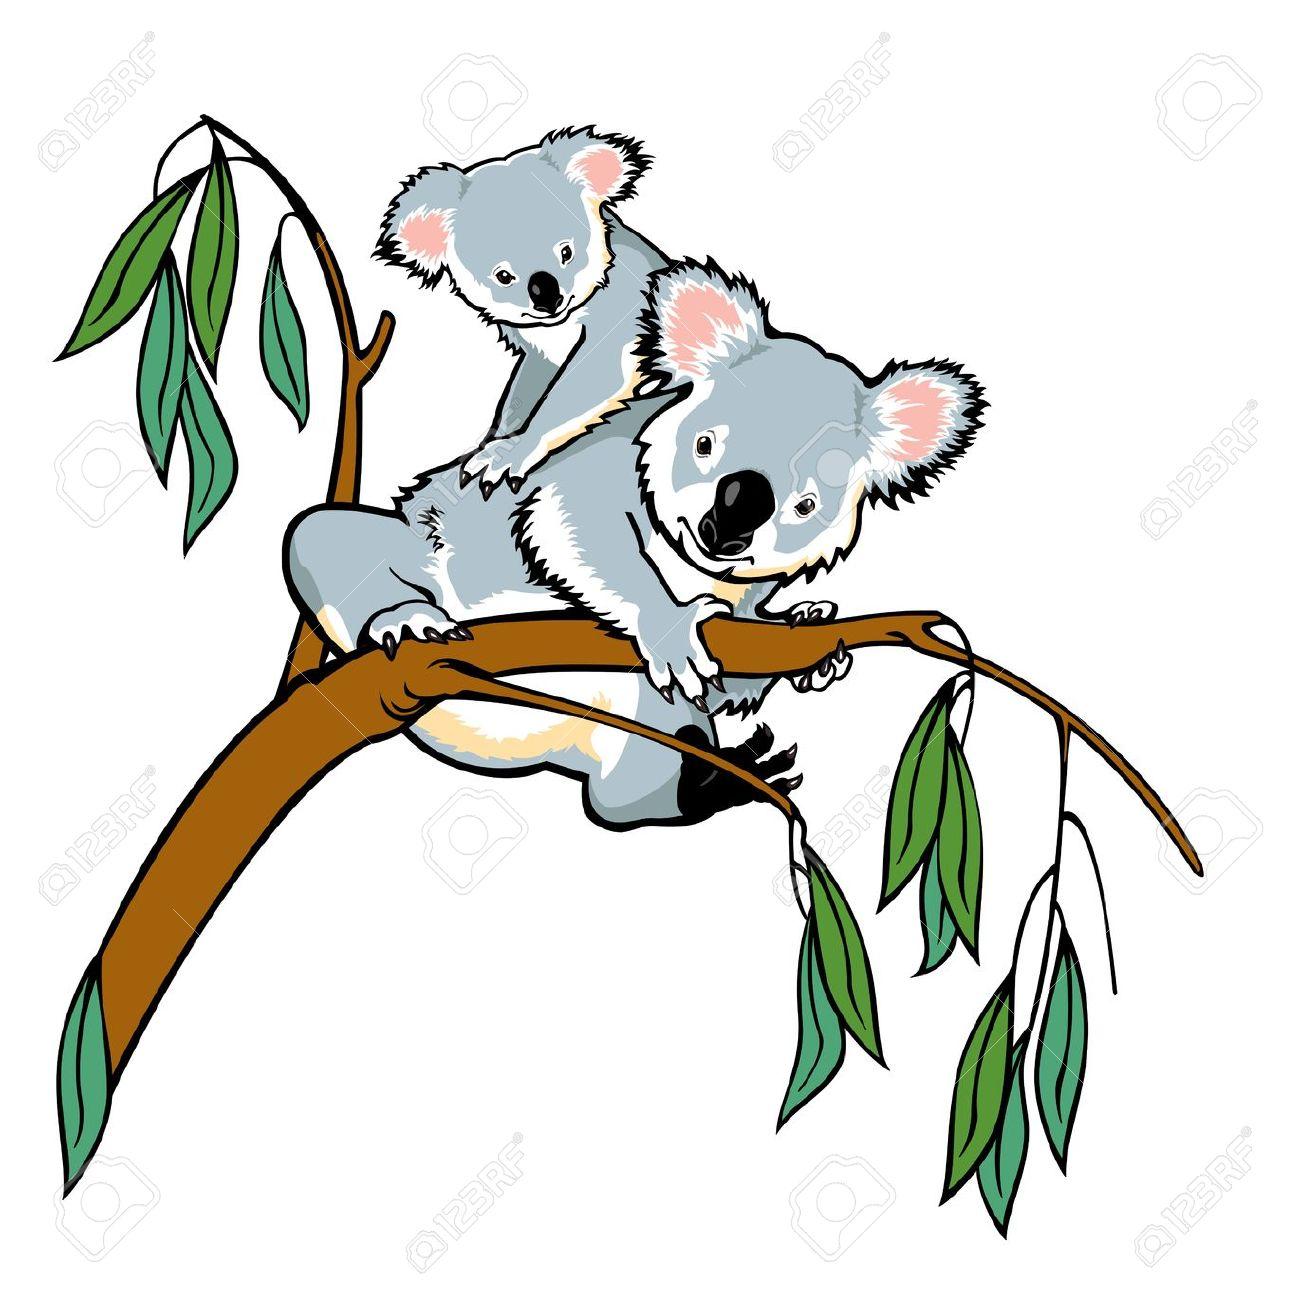 Eucalyptus tree drawing clipart.